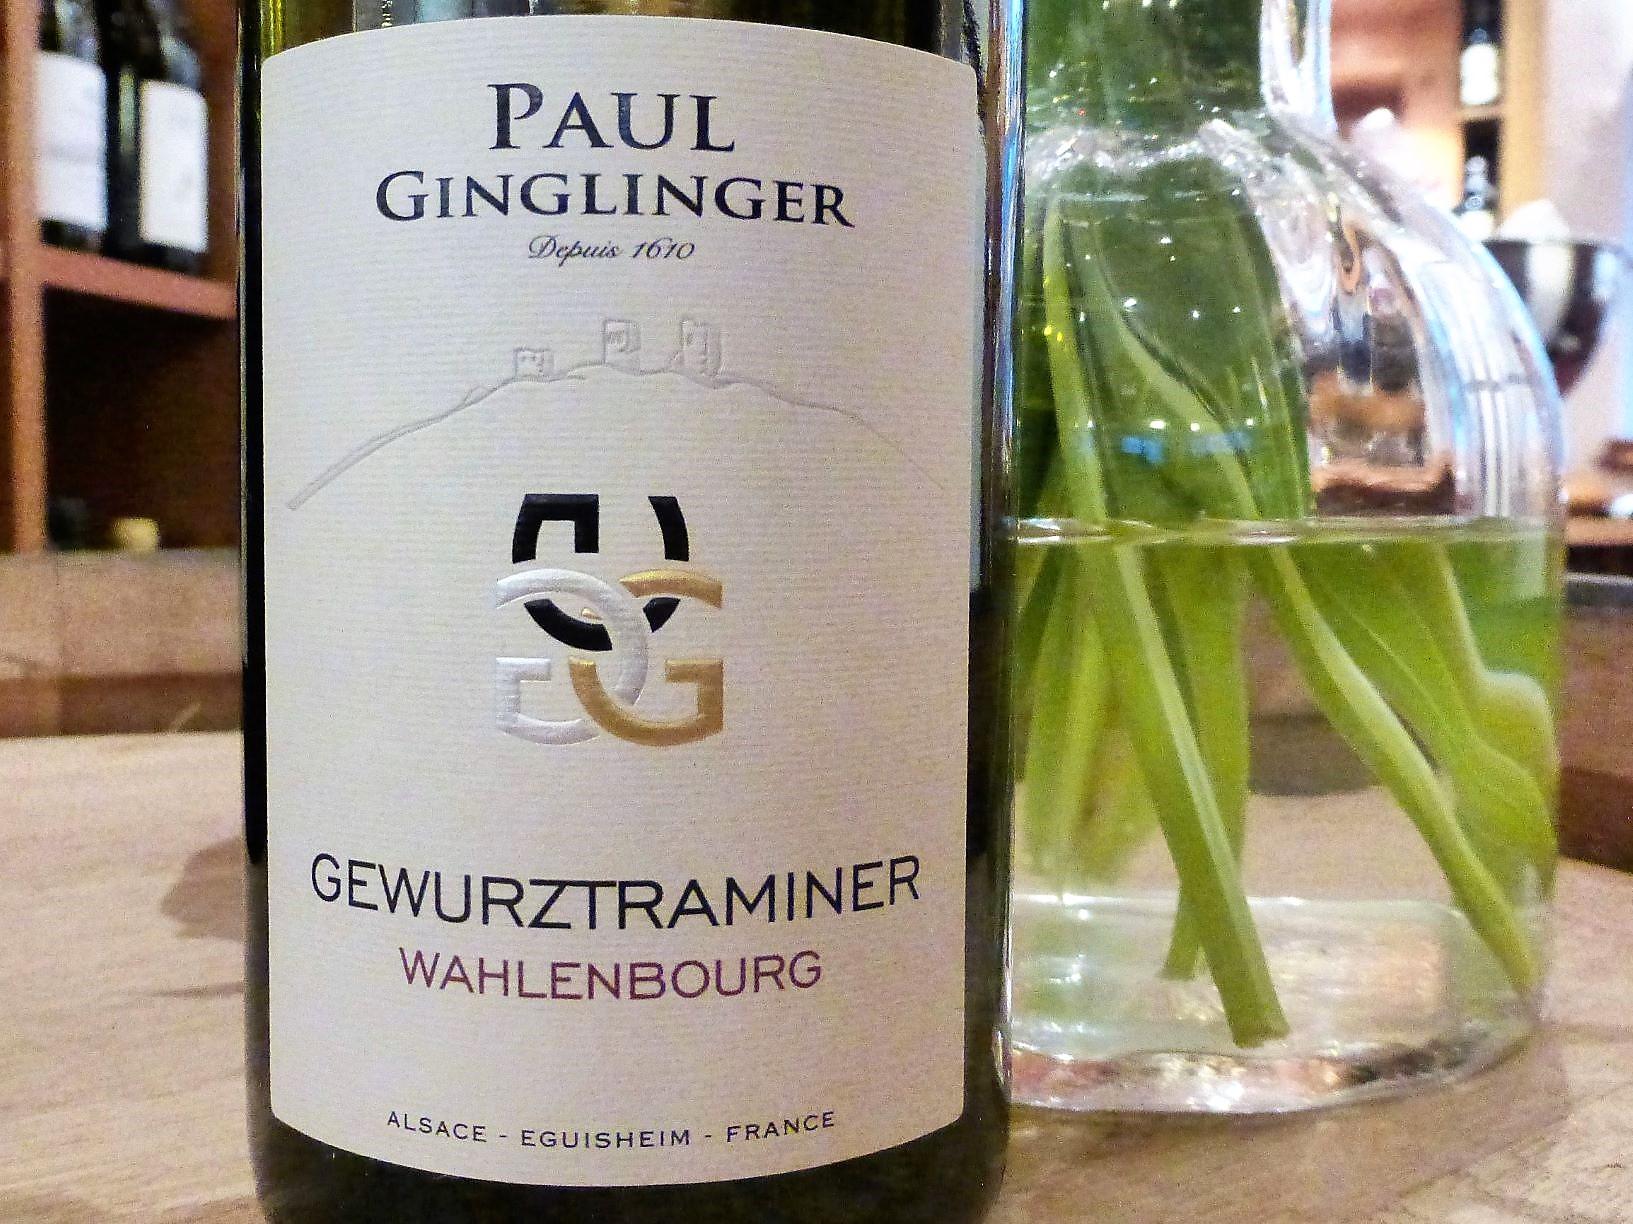 2016 Gewürztraminer Wahlenbourg Alsace AOC, Paul Ginglinger